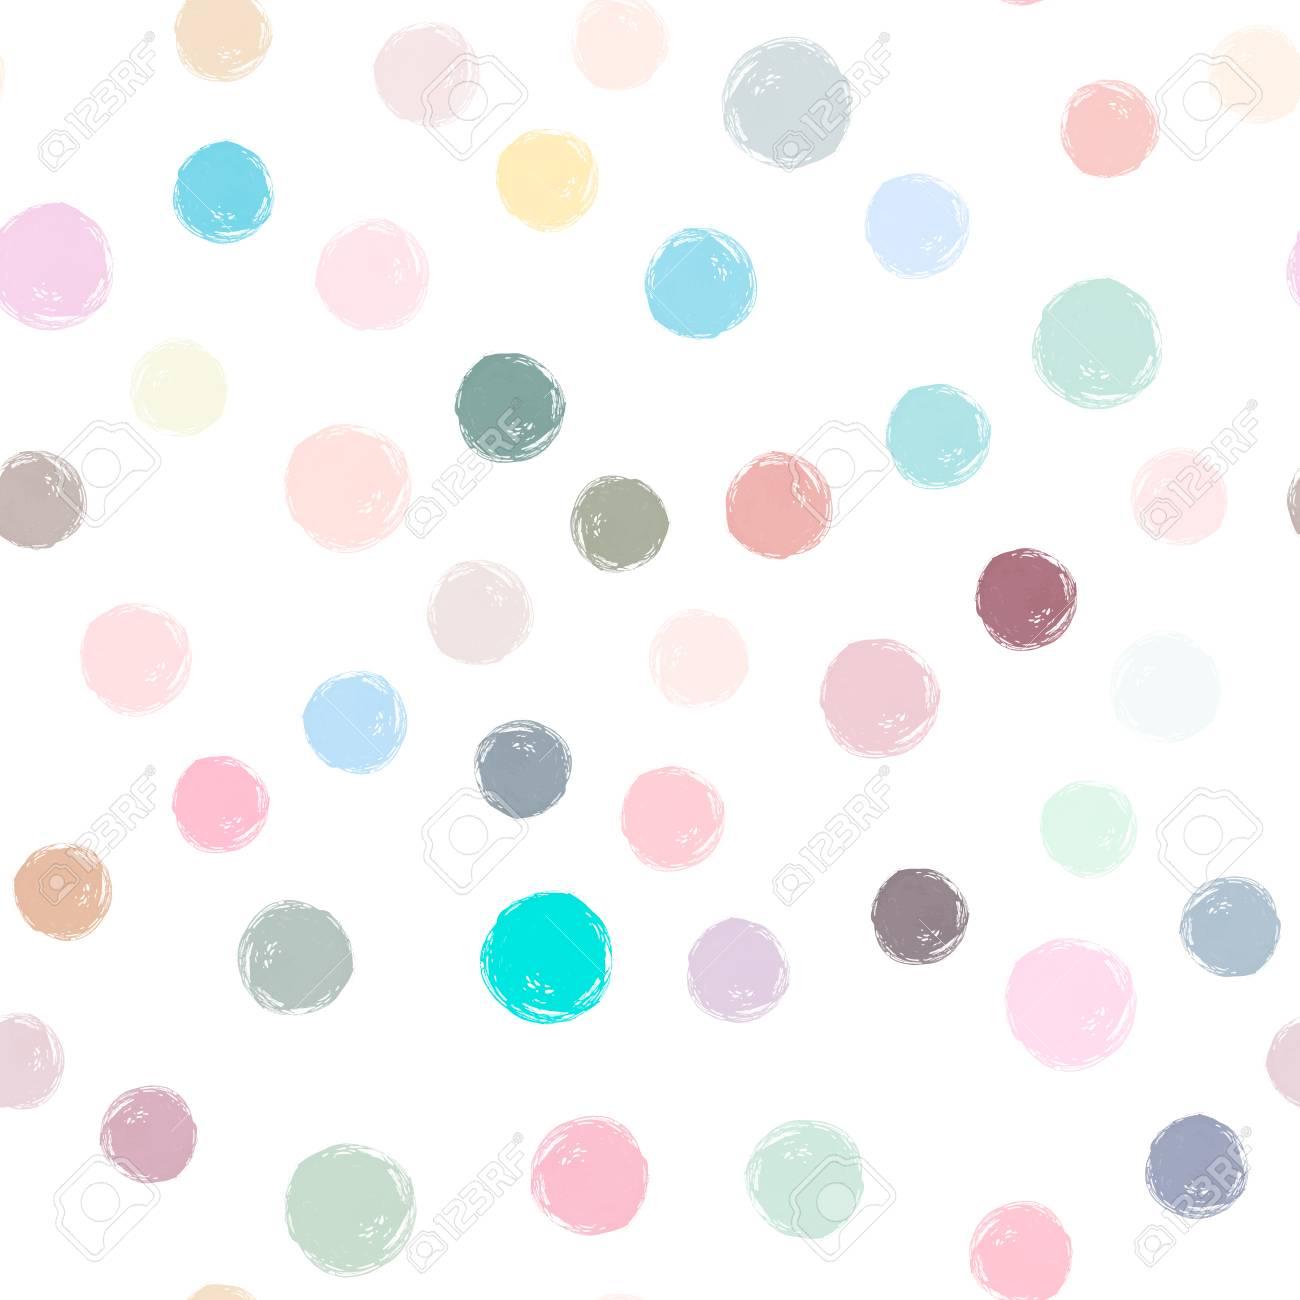 A Vector Watercolor Circles Seamless Pattern Pastel Watercolor Royalty Free Cliparts Vectors And Stock Illustration Image 90226264